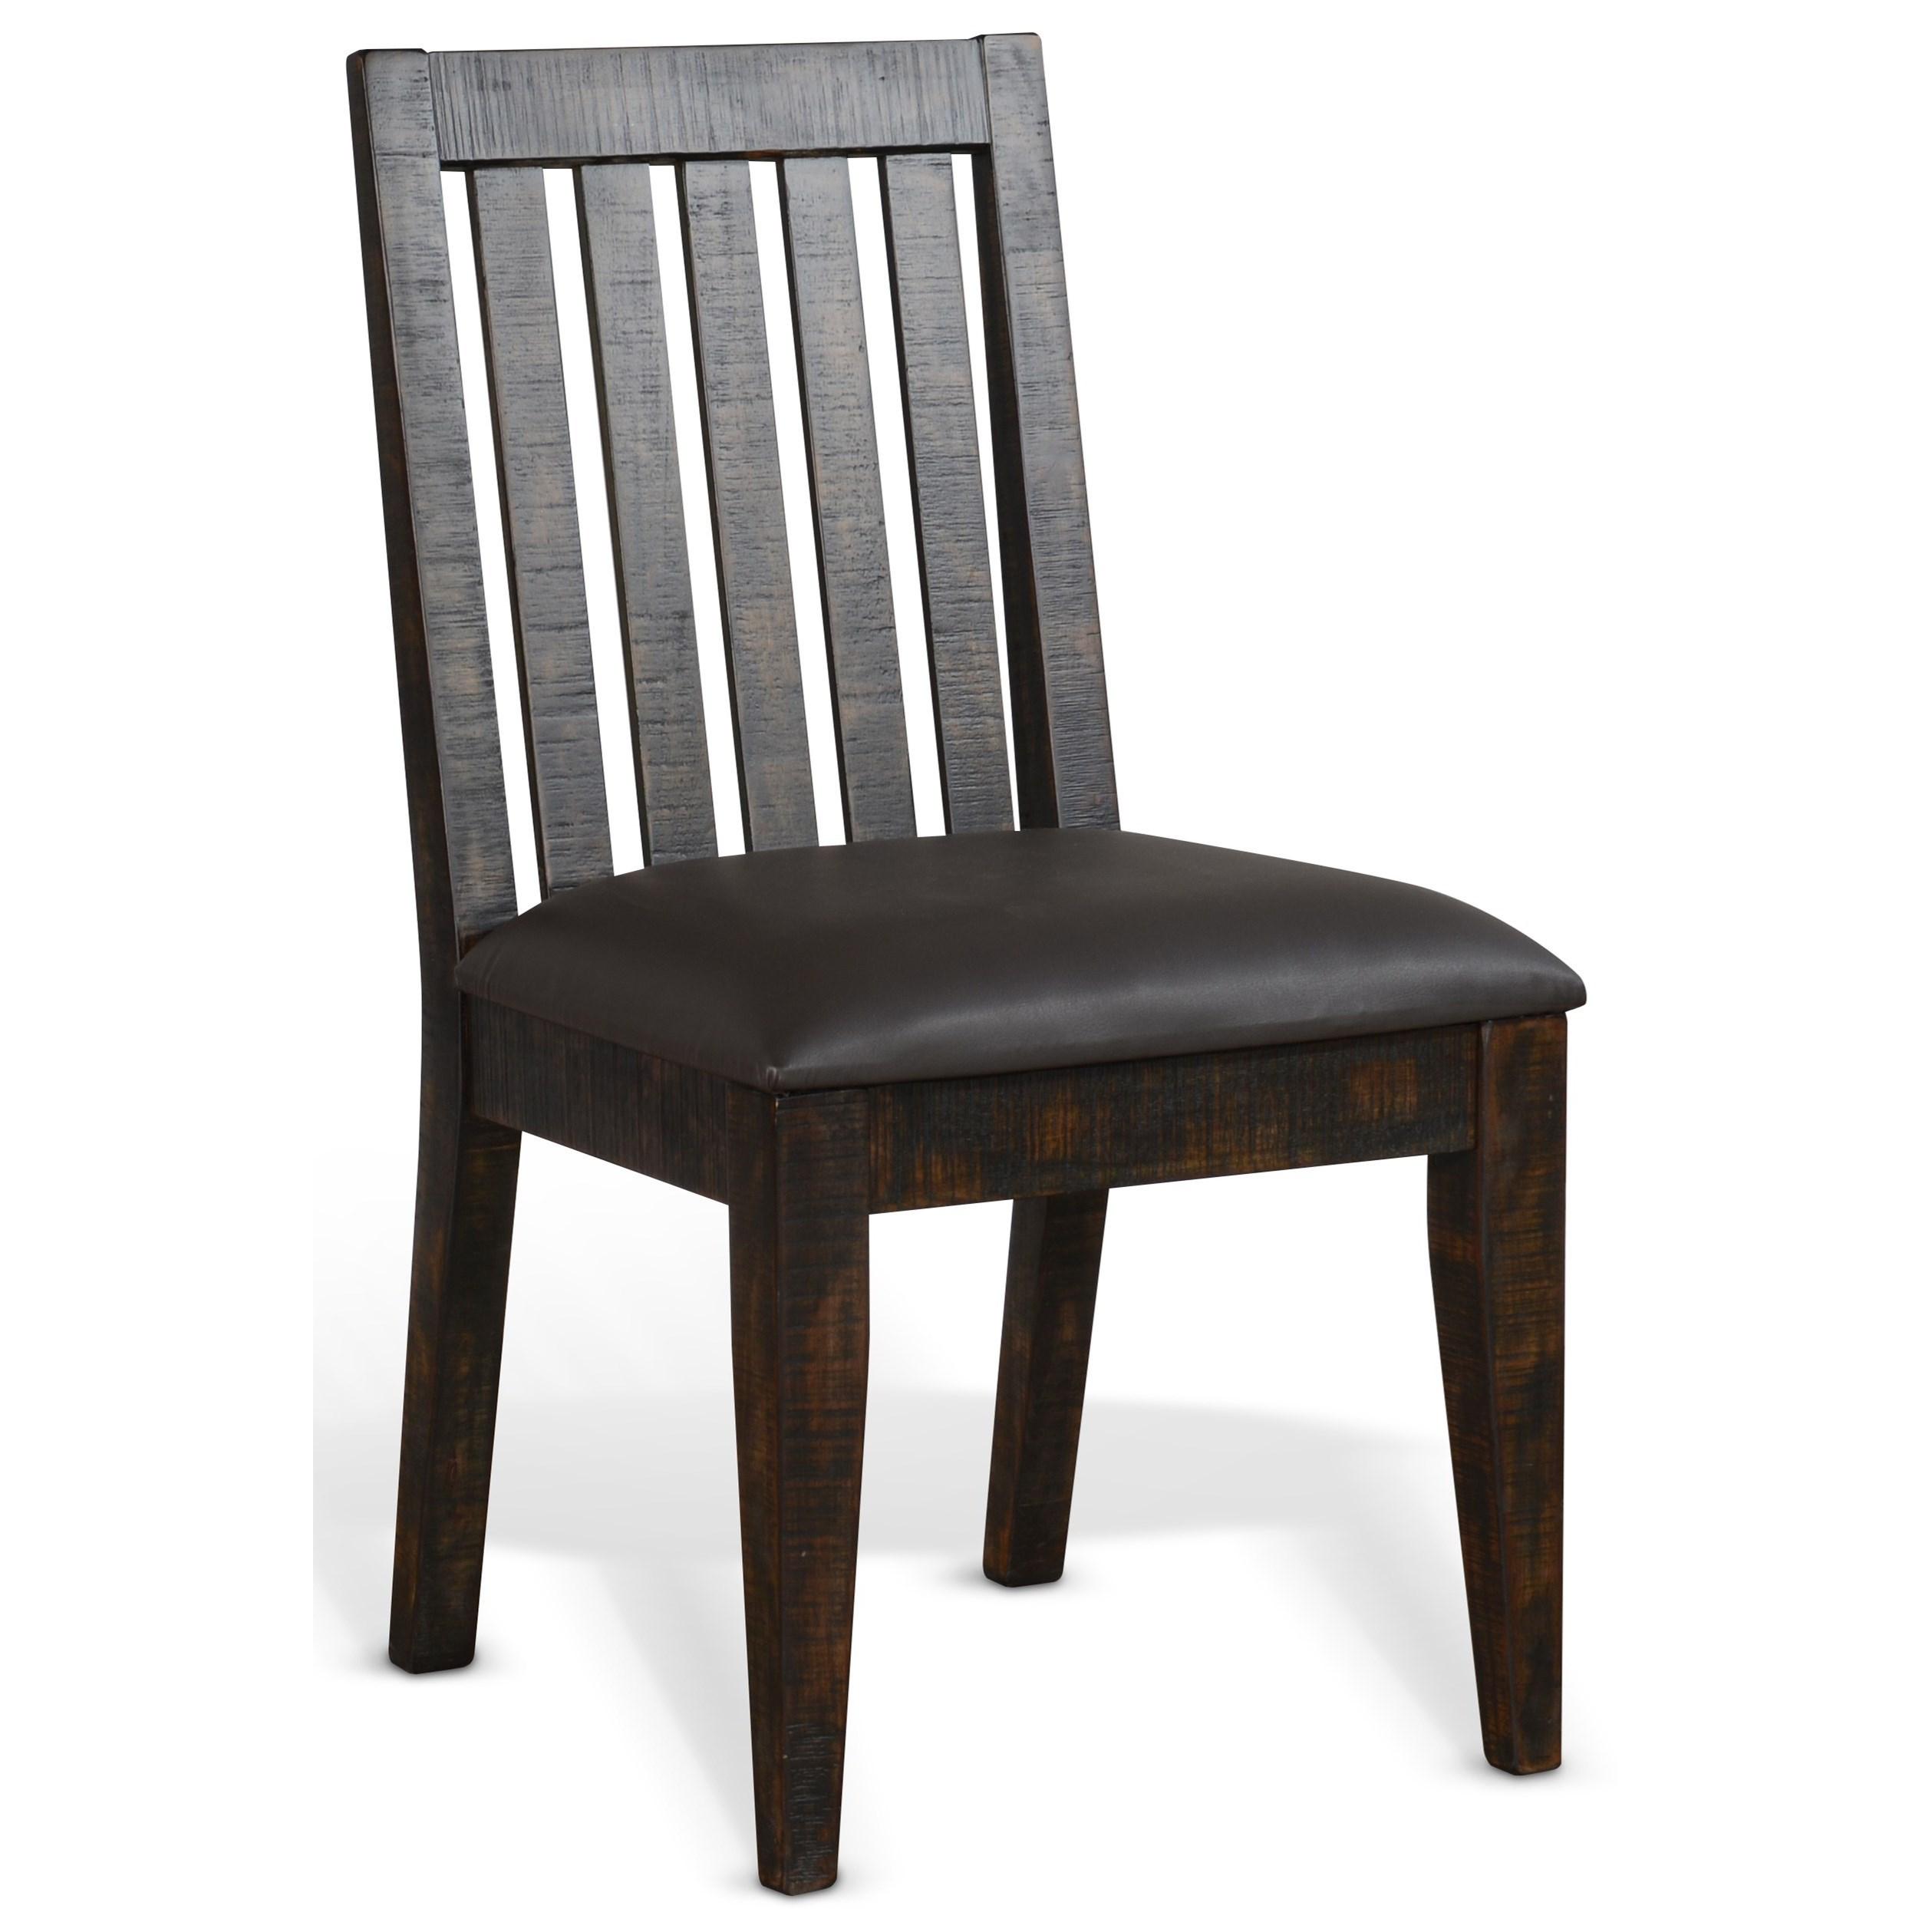 Nassau Slatback Chair w/ Cushion Seat by Sunny Designs at Becker Furniture